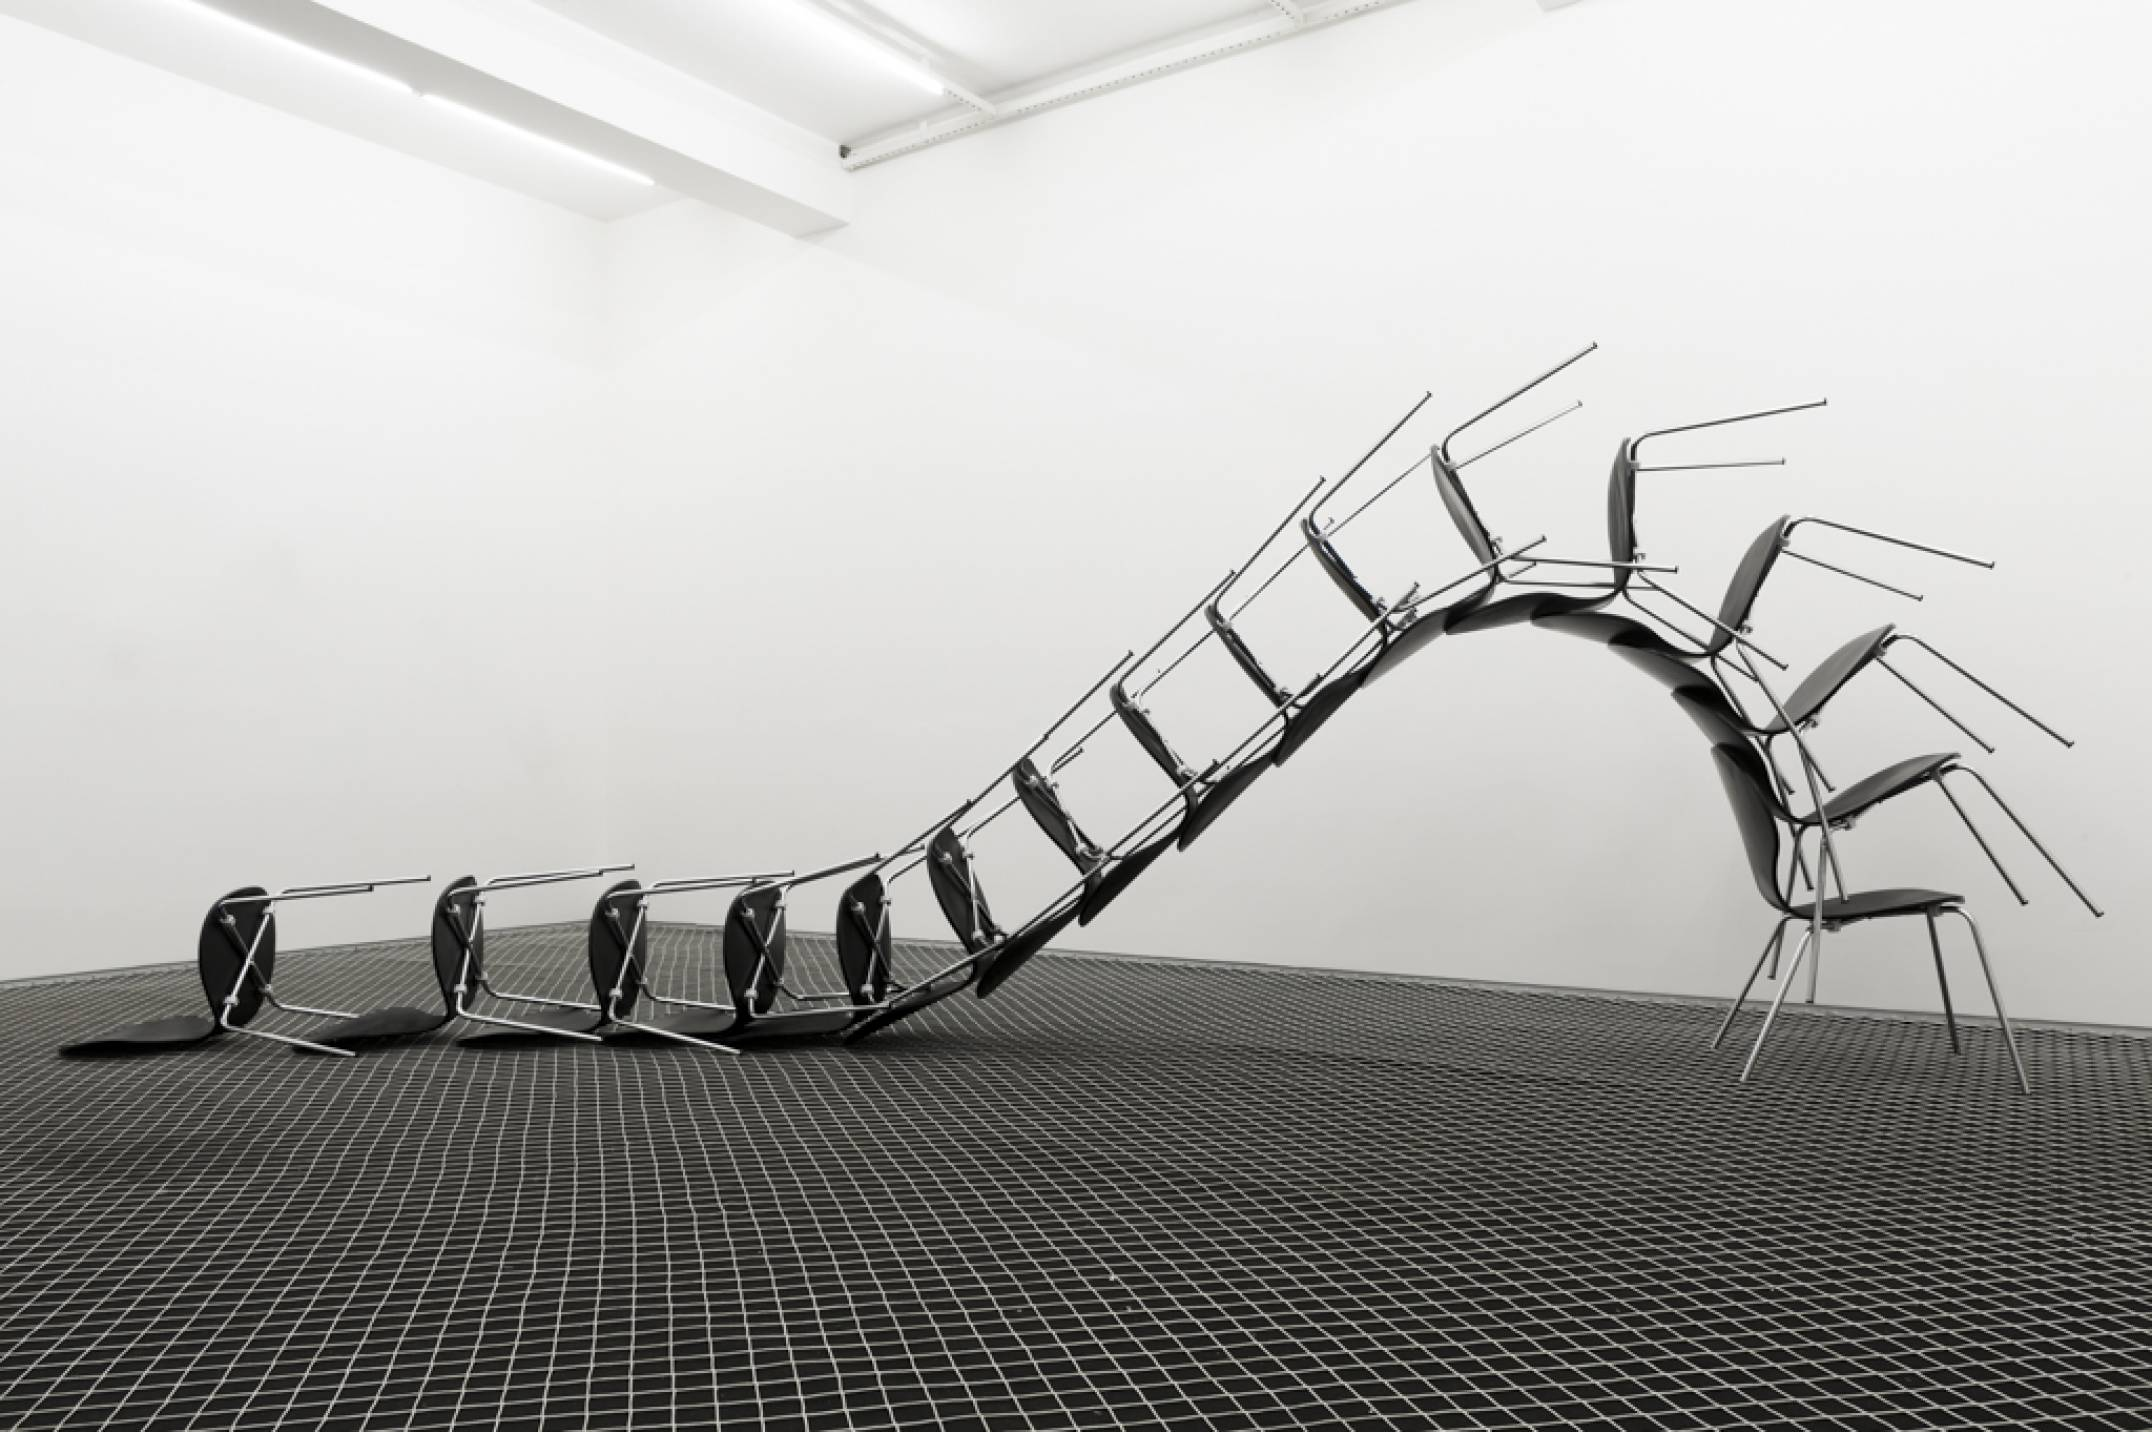 Roberto Winter,<em>Decadência (anti-monumento Ross Ulbricht)</em>, 2017, metal, wood, plastic, 150 × 450 × 70 cm - Mendes Wood DM